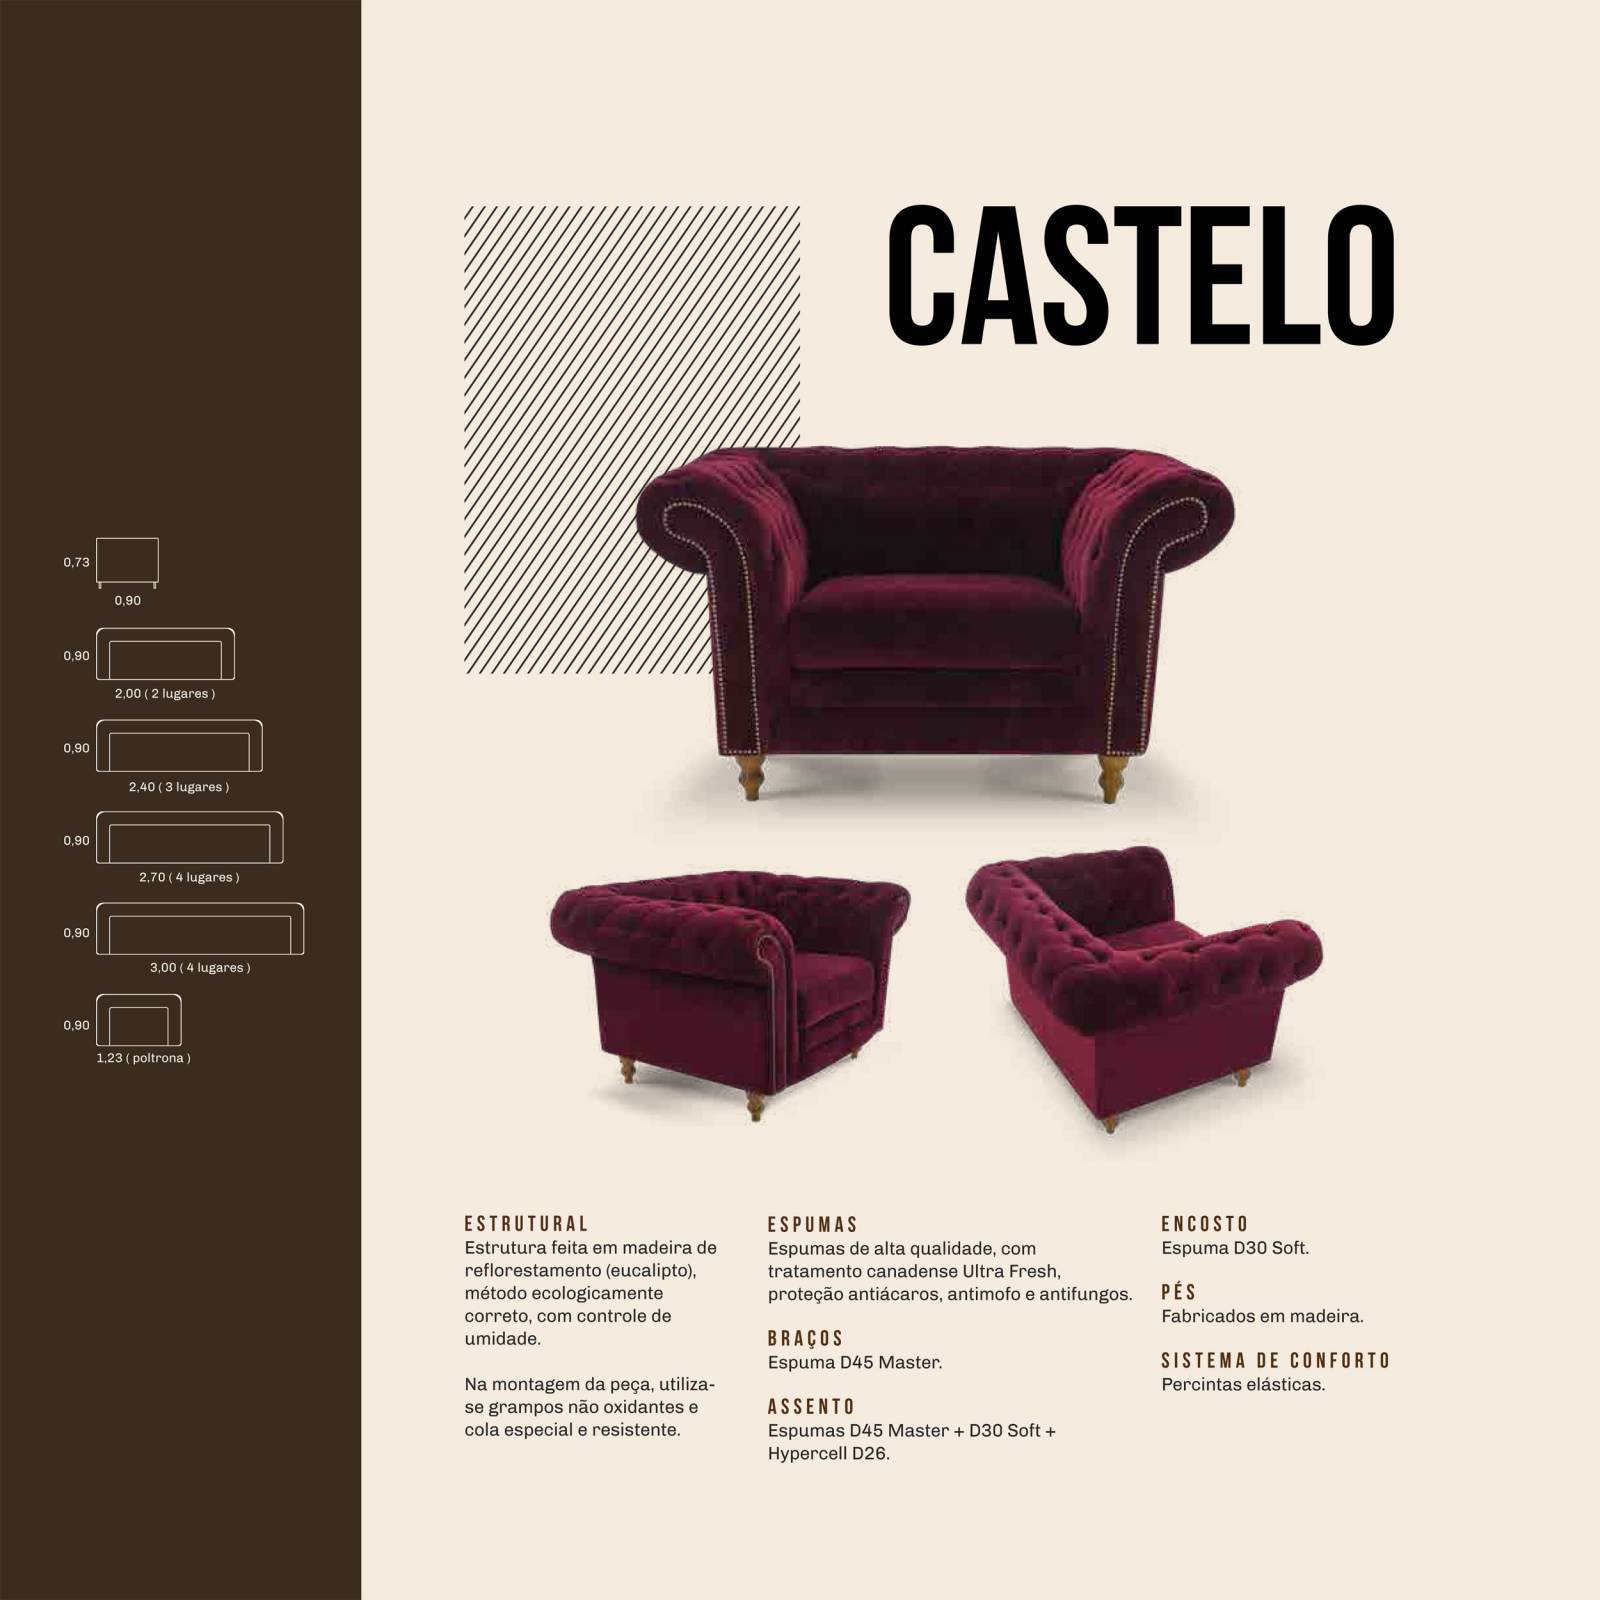 Poltrona Castelo Mannes - All Home